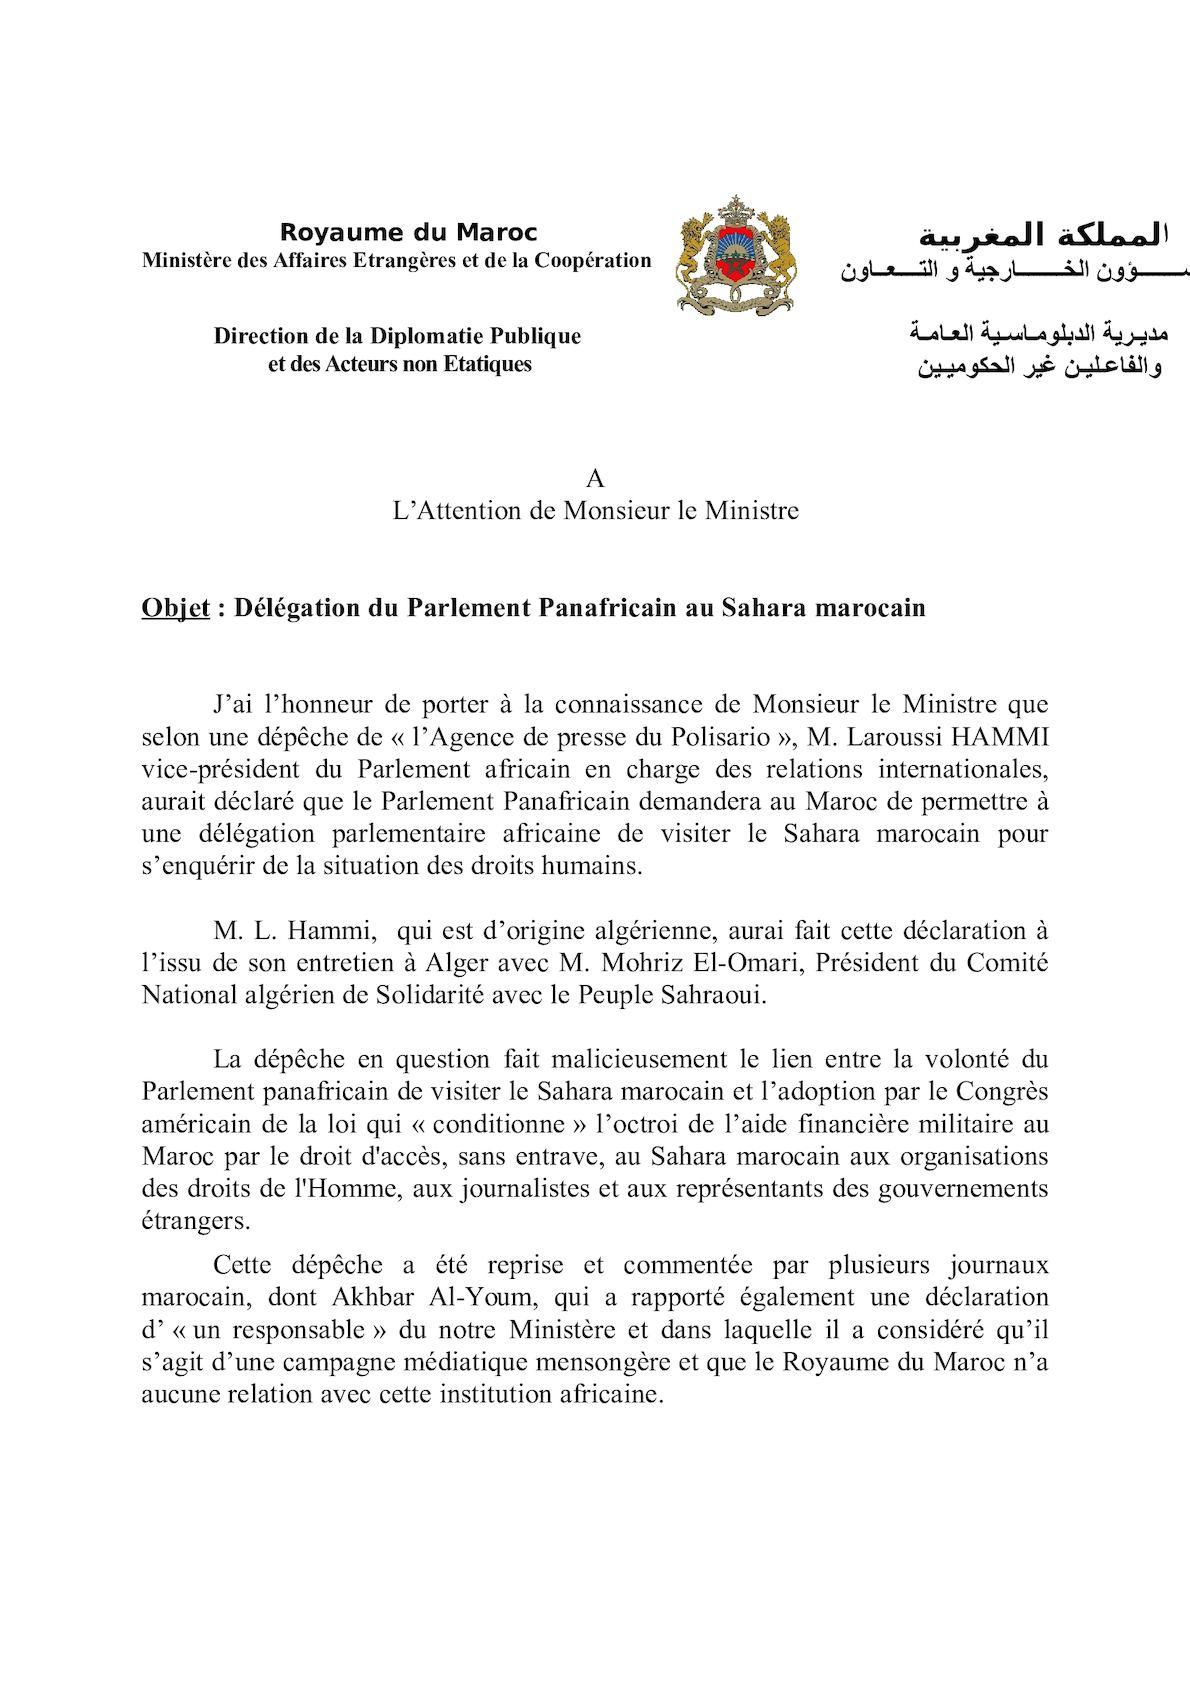 Note Parlement Panafricain Sahara Et Fiche